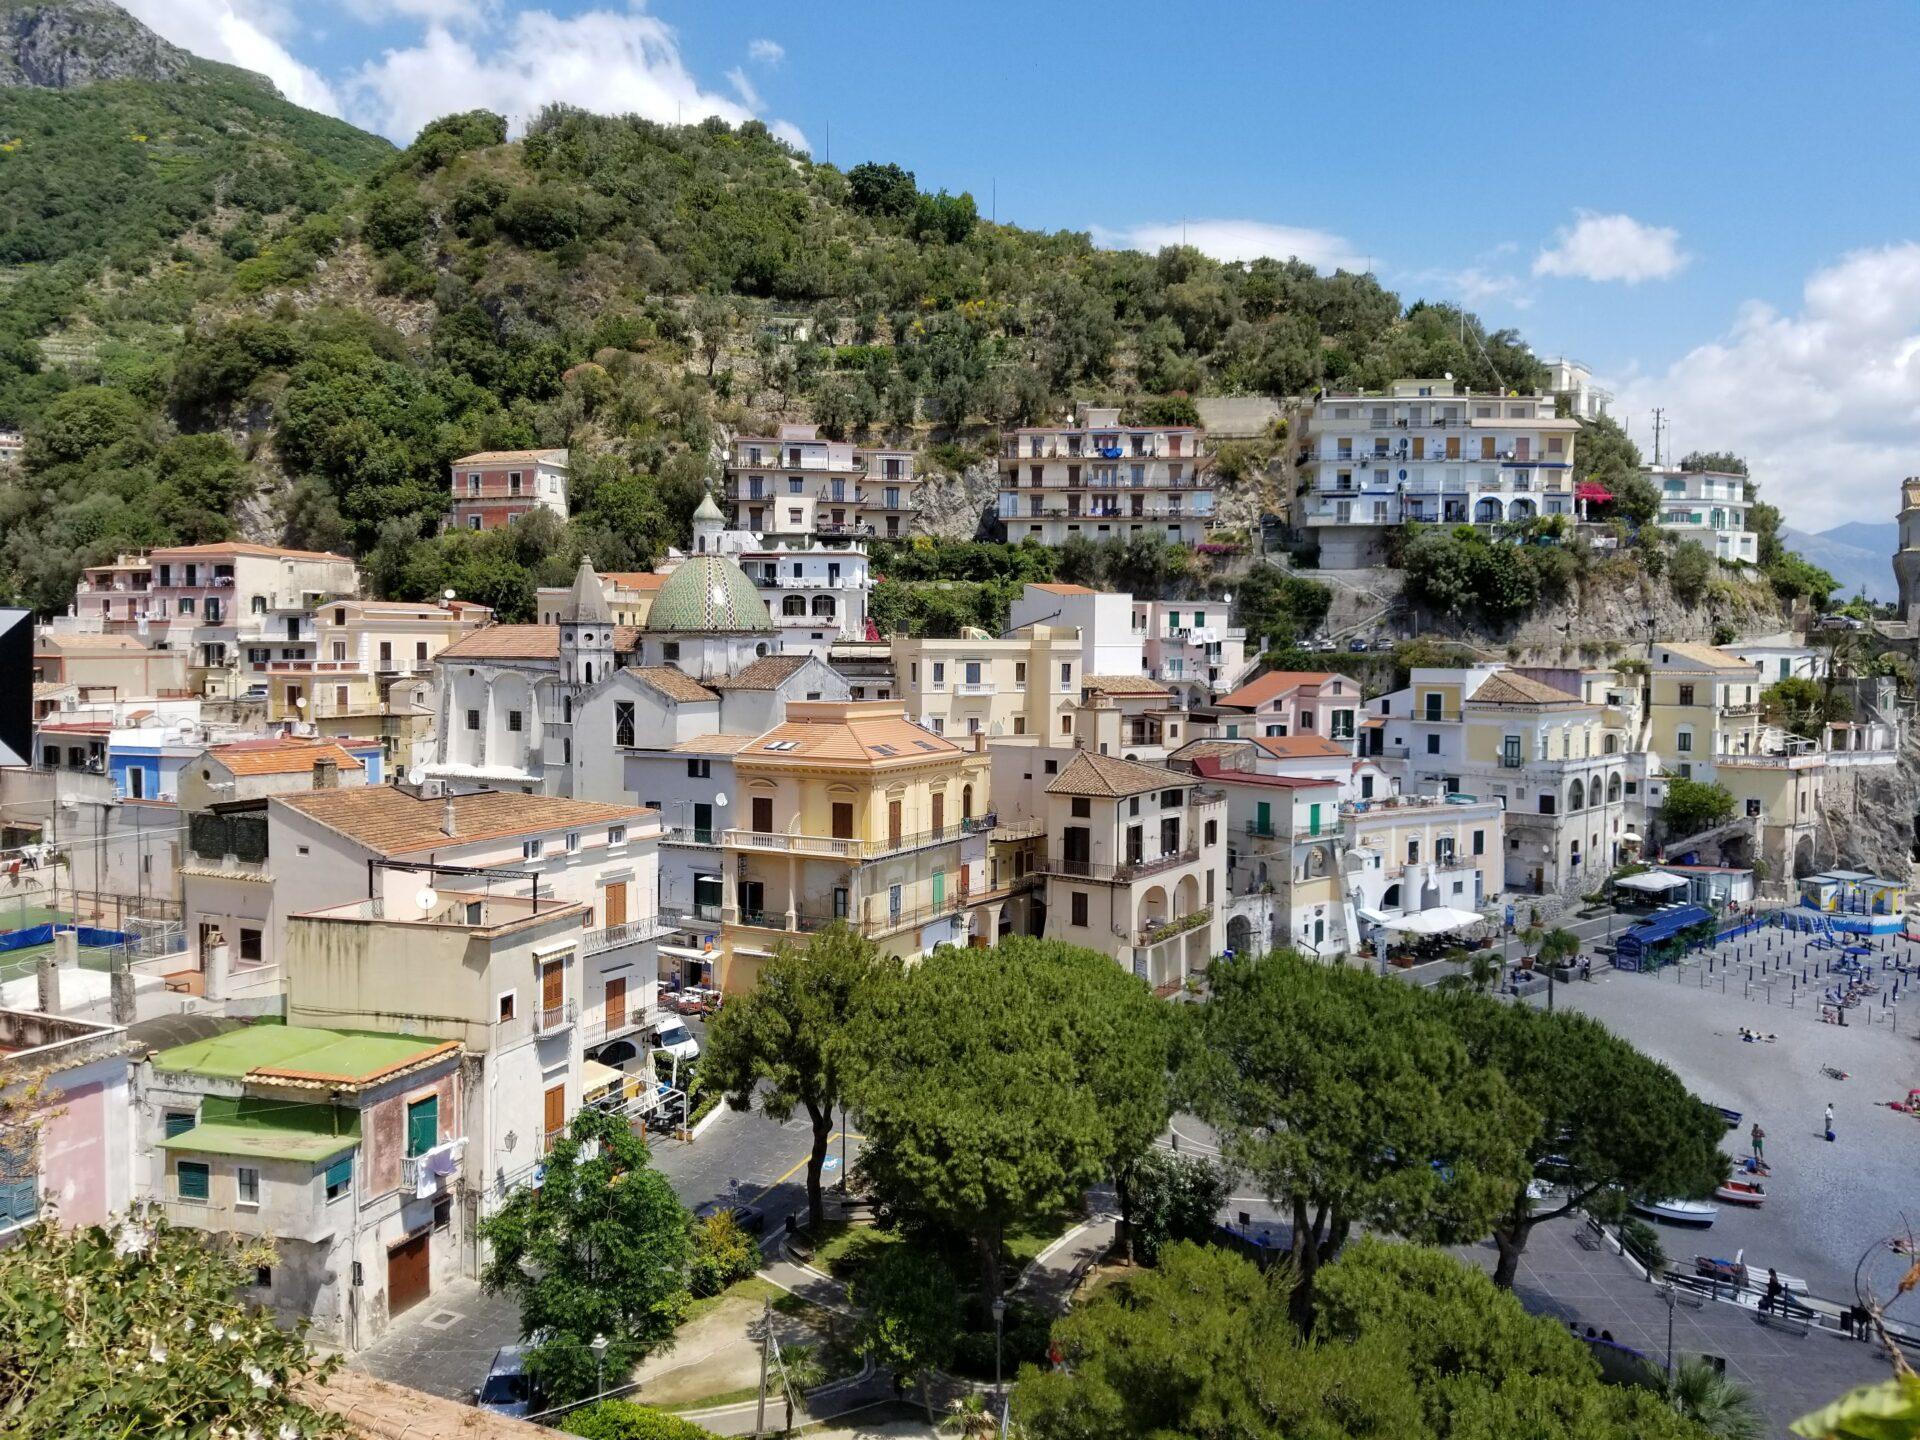 Amalfi Coasto of Italy